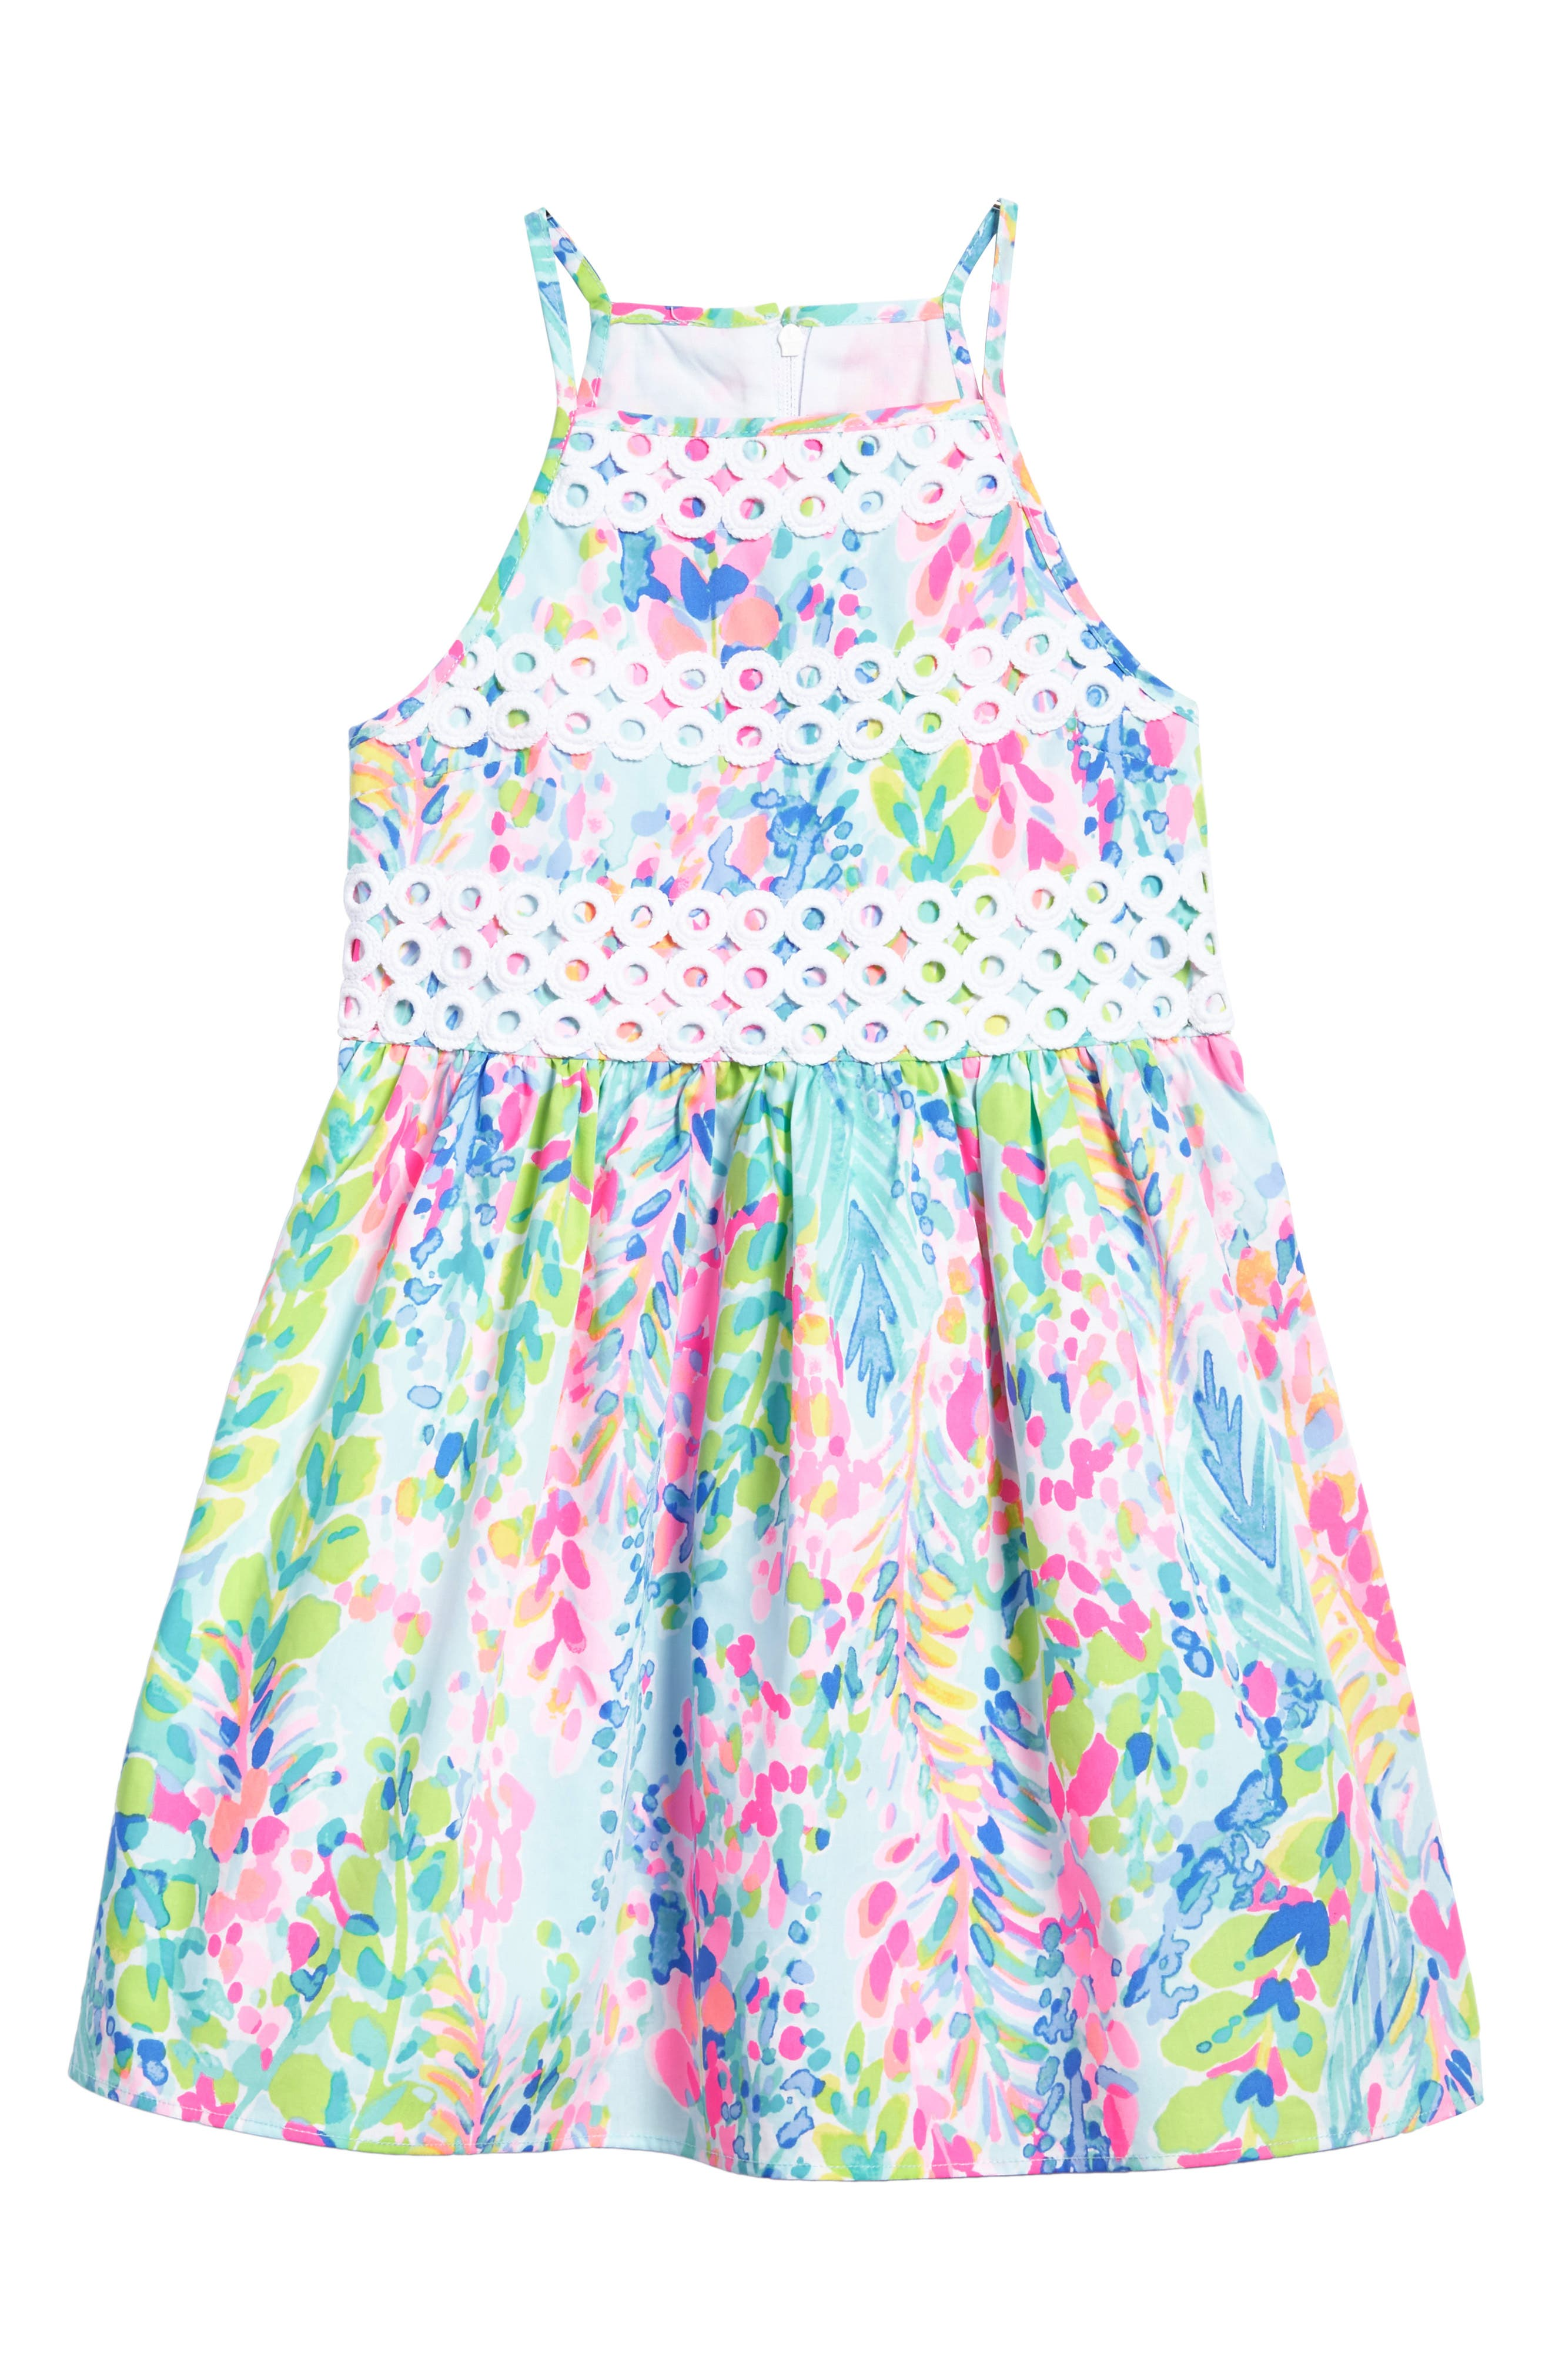 Alternate Image 1 Selected - Lilly Pulitzer® Elize Fit & Flare Dress (Toddler Girls, Little Girls & Big Girls)